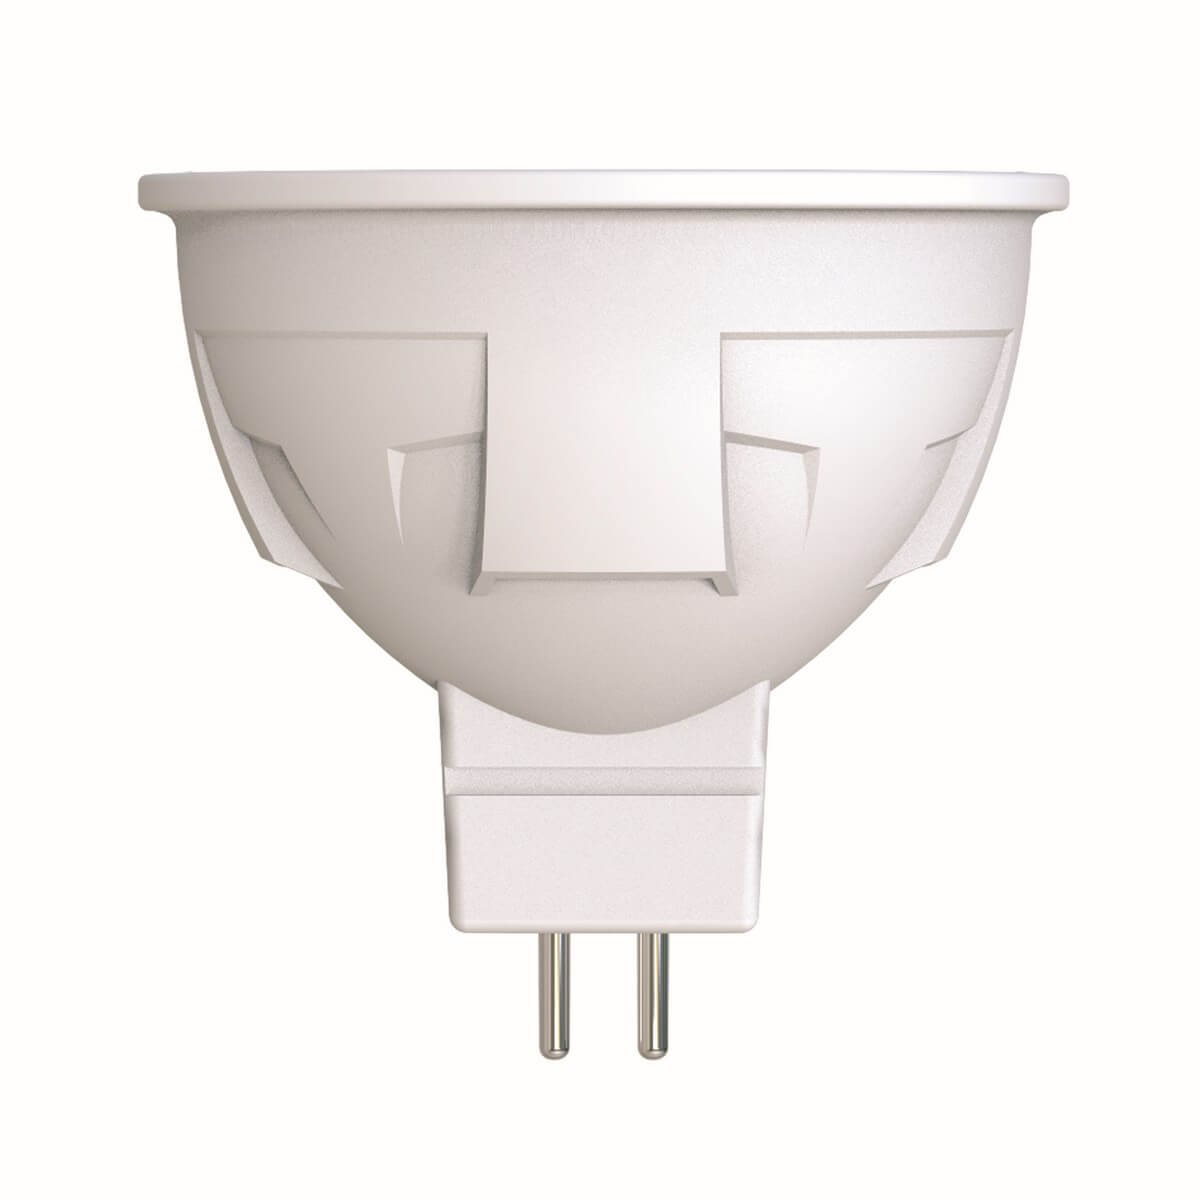 Лампа светодиодная диммируемая (UL-00003989) Uniel GU5.3 6W 4000K матовая LED-JCDR 6W/NW/GU5.3/FR/DIM PLP01WH